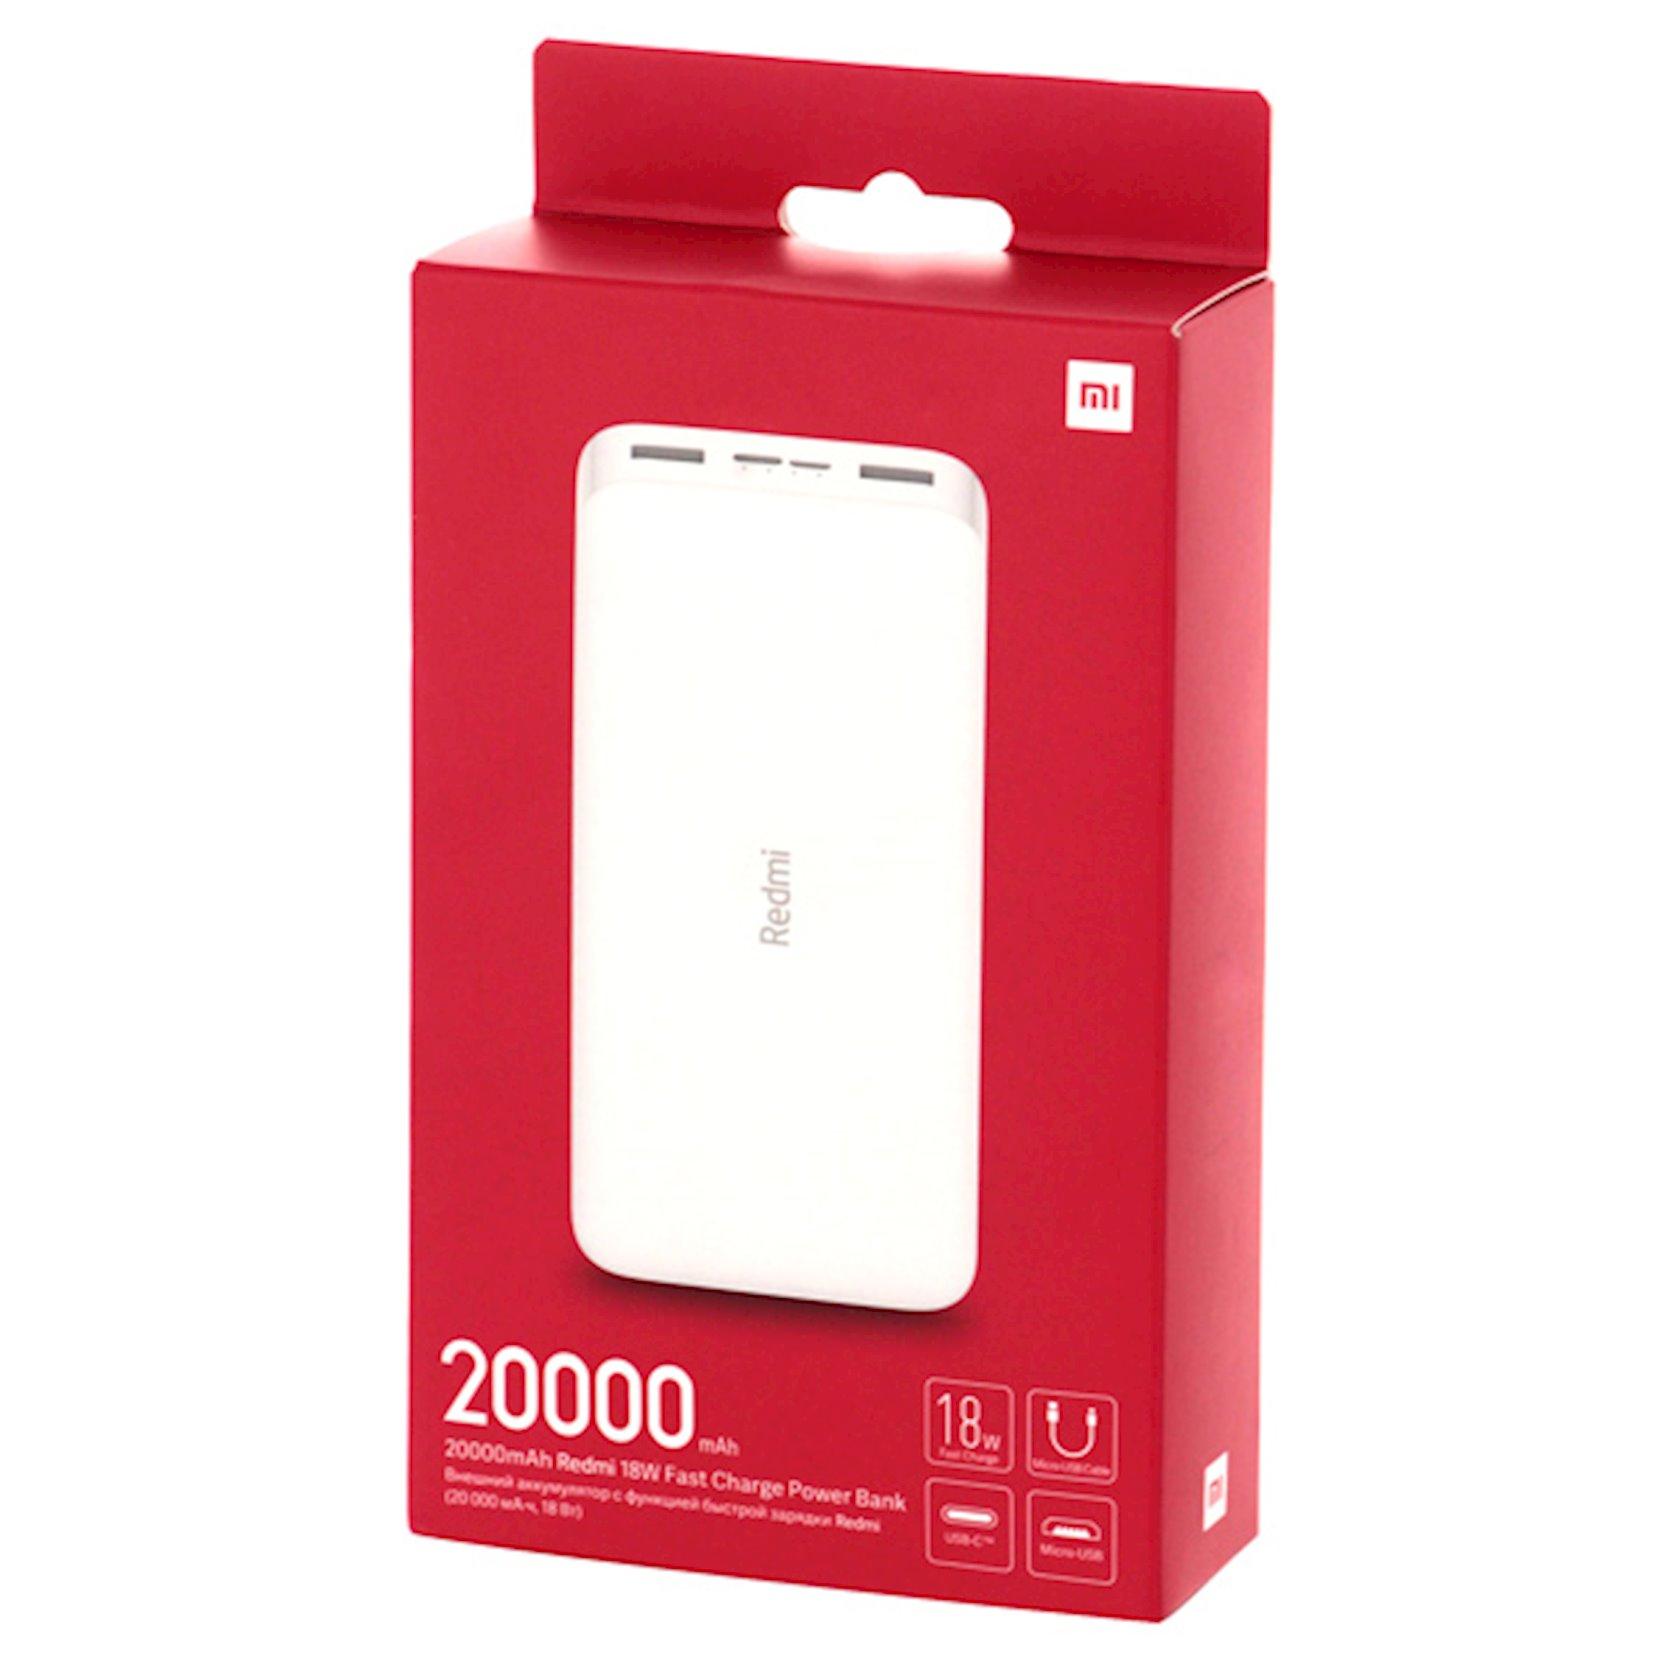 Power Bank Xiaomi Redmi Fast Charge Power Bank 20000mAs